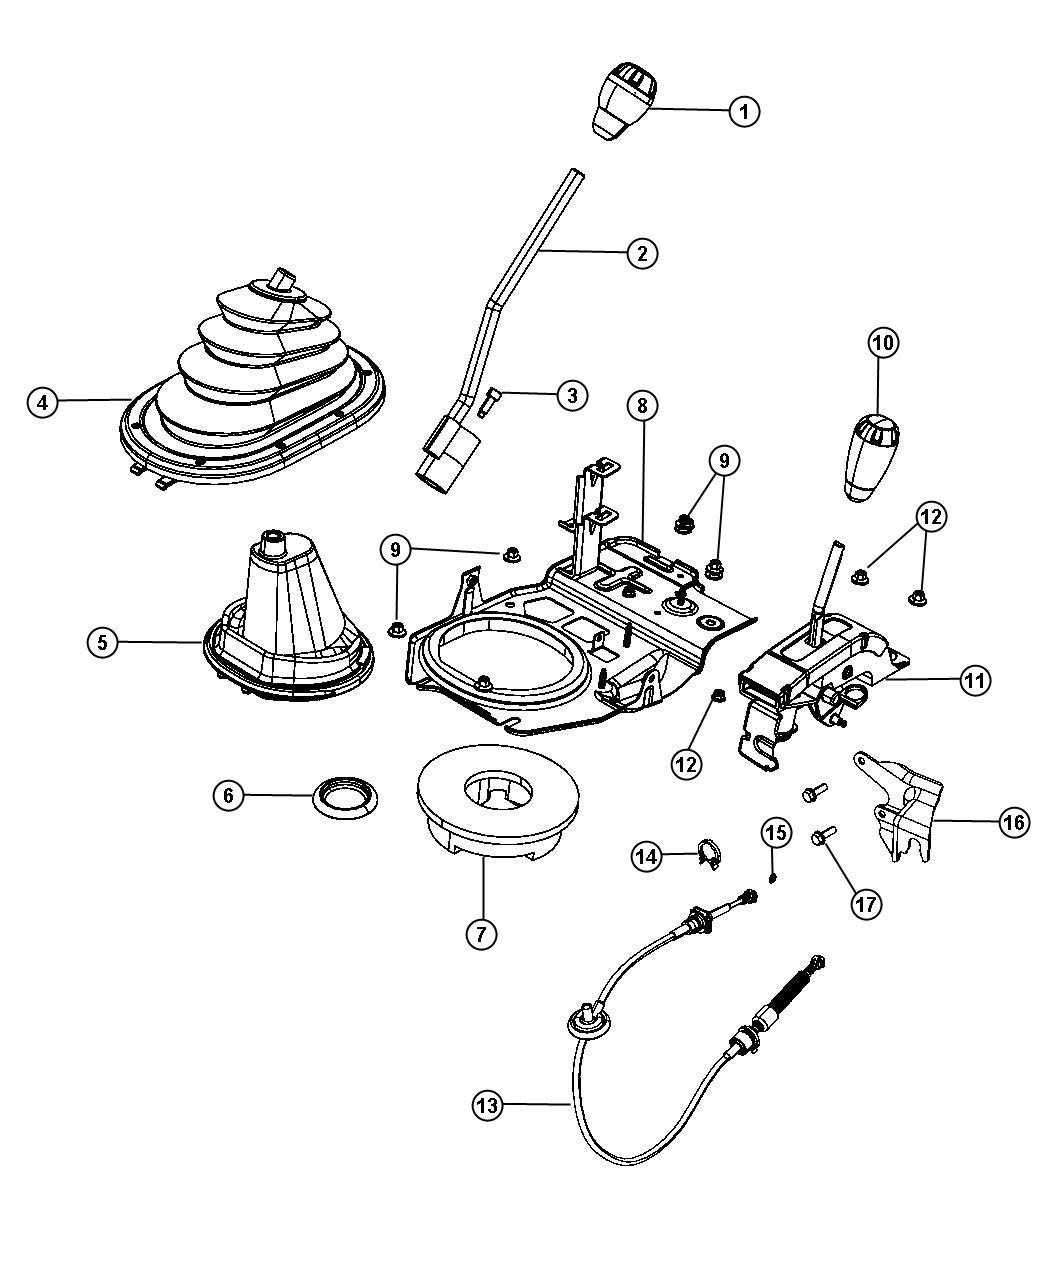 Jeep Wrangler Lever. Gearshift, manual transmission shift